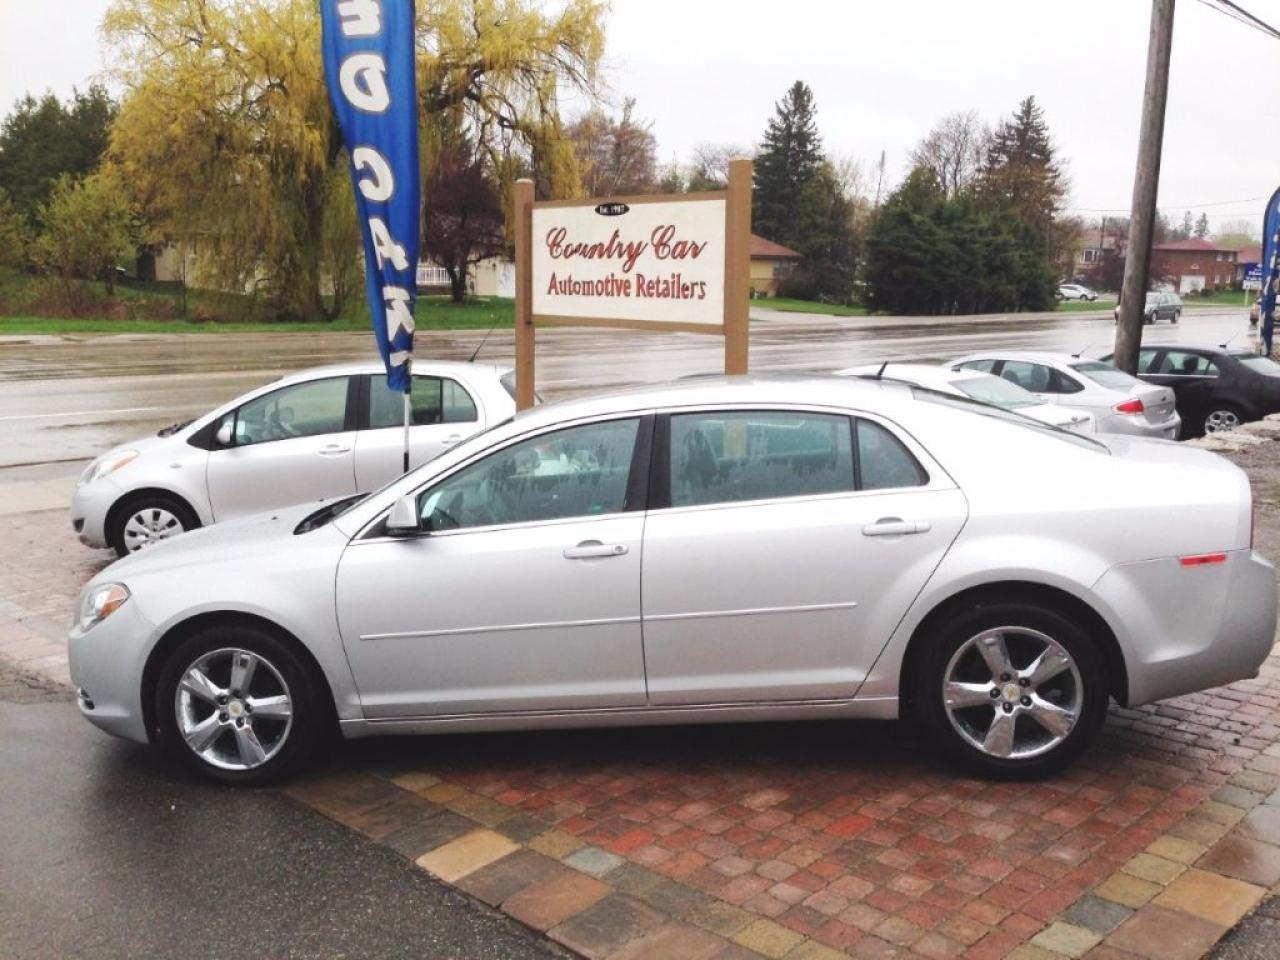 2011 Chevrolet Malibu LT PLATINUM EDITION - Financing Available